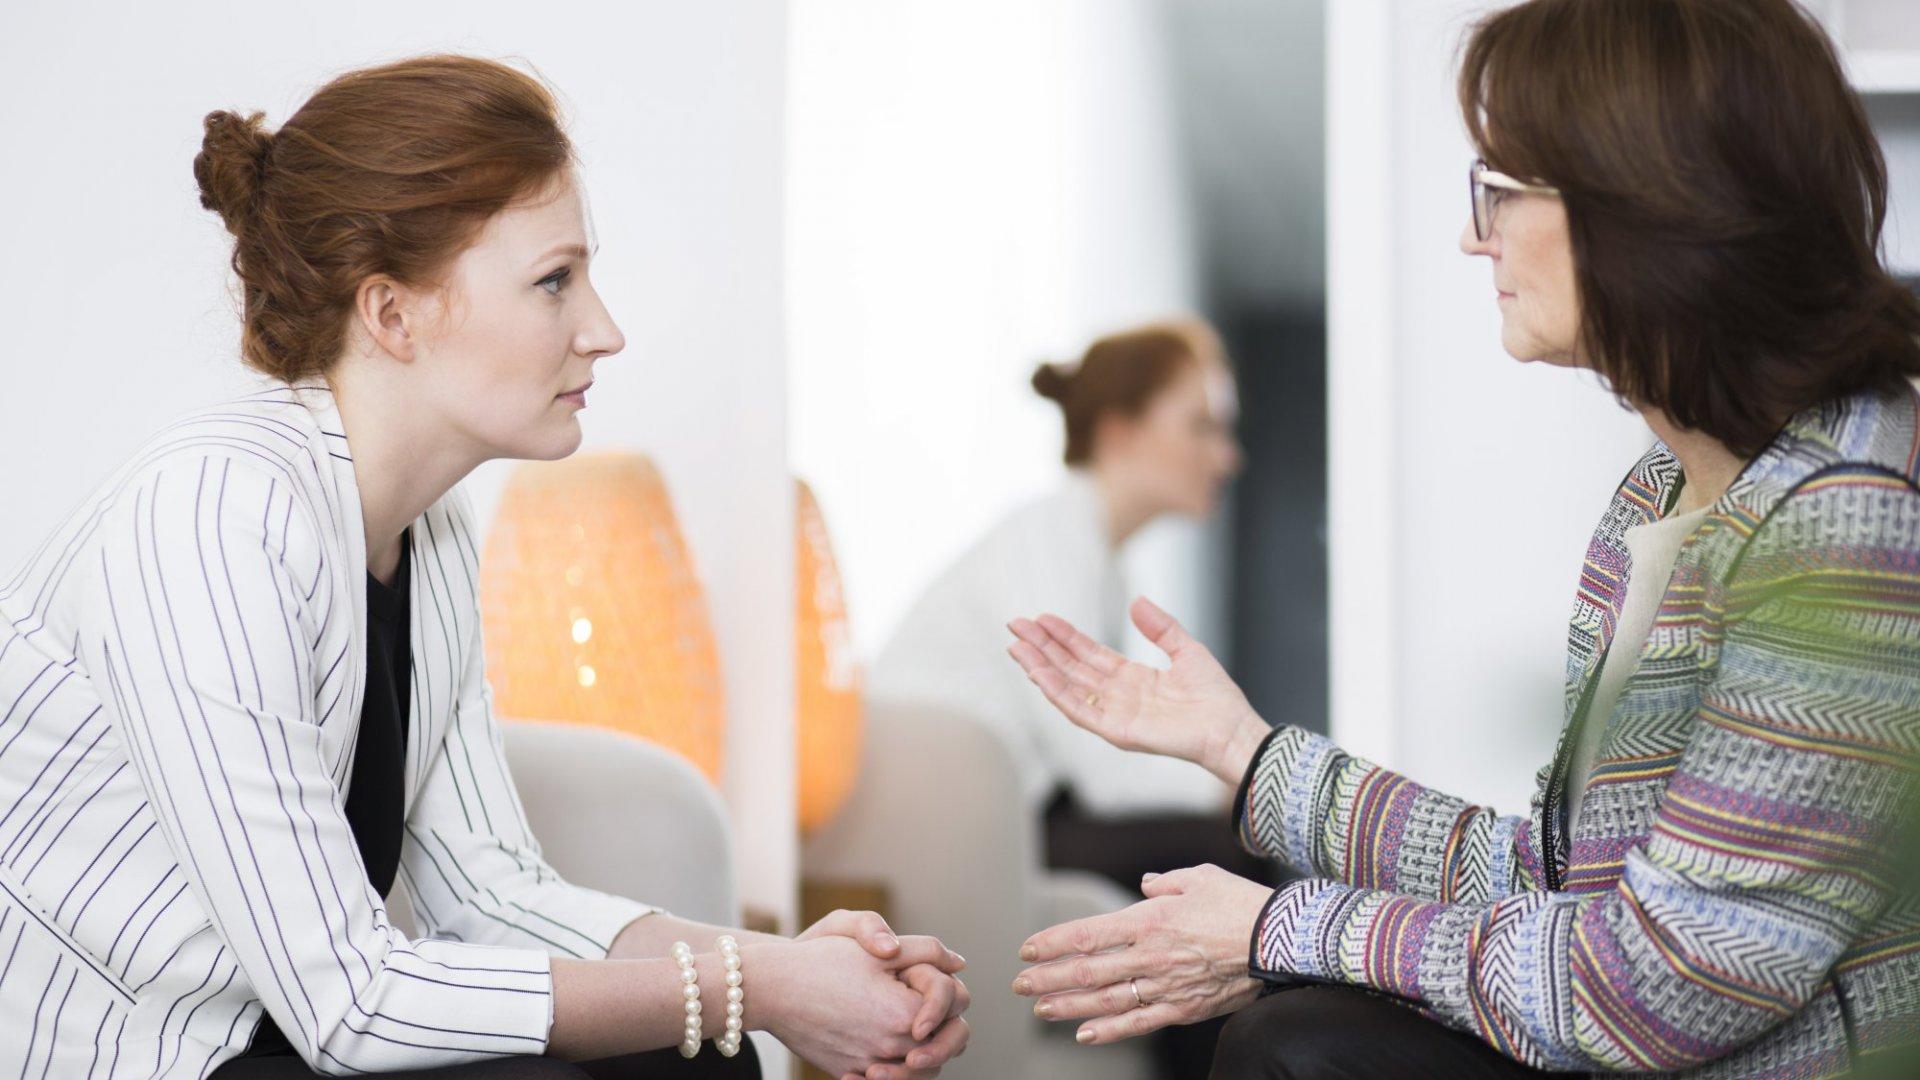 Positive Feedback? Negative Feedback? 11 Ways to Productively Share Feedback